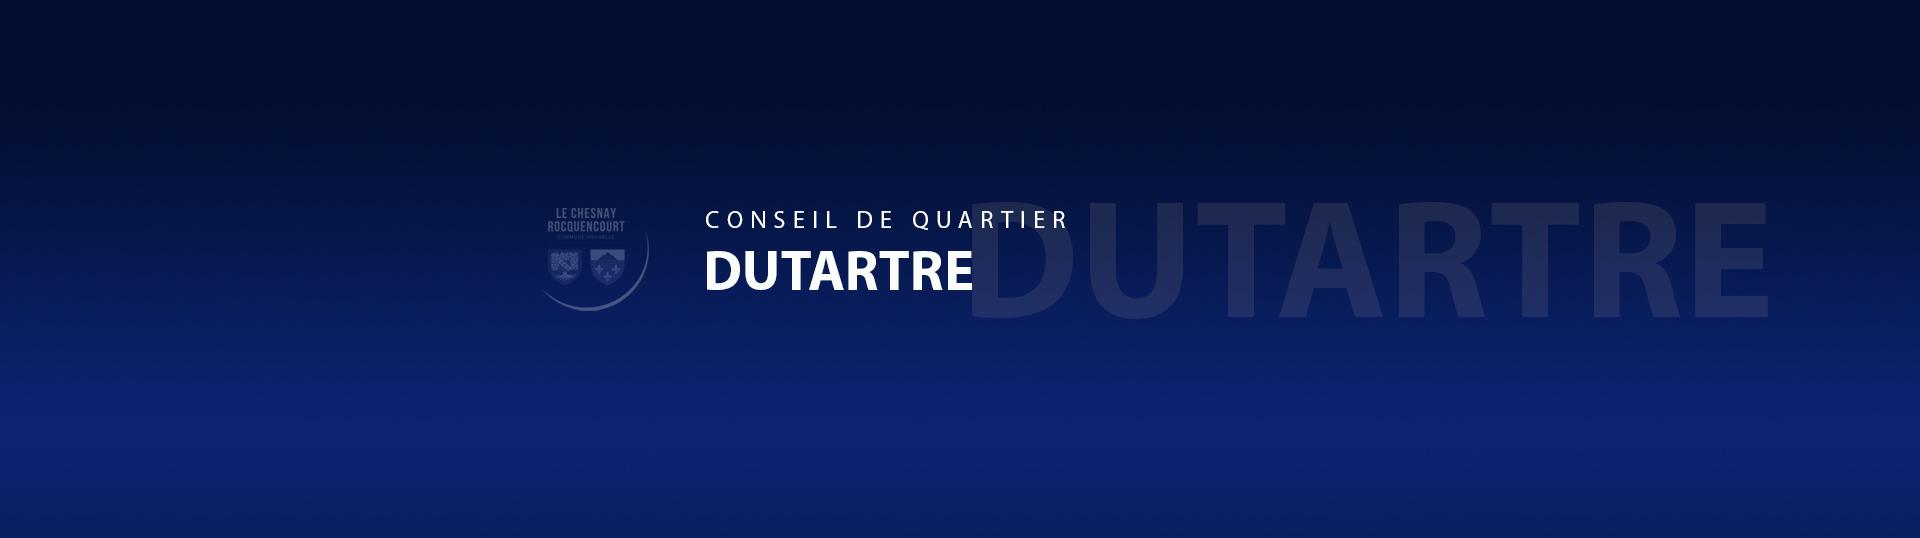 CDQ Dutartre